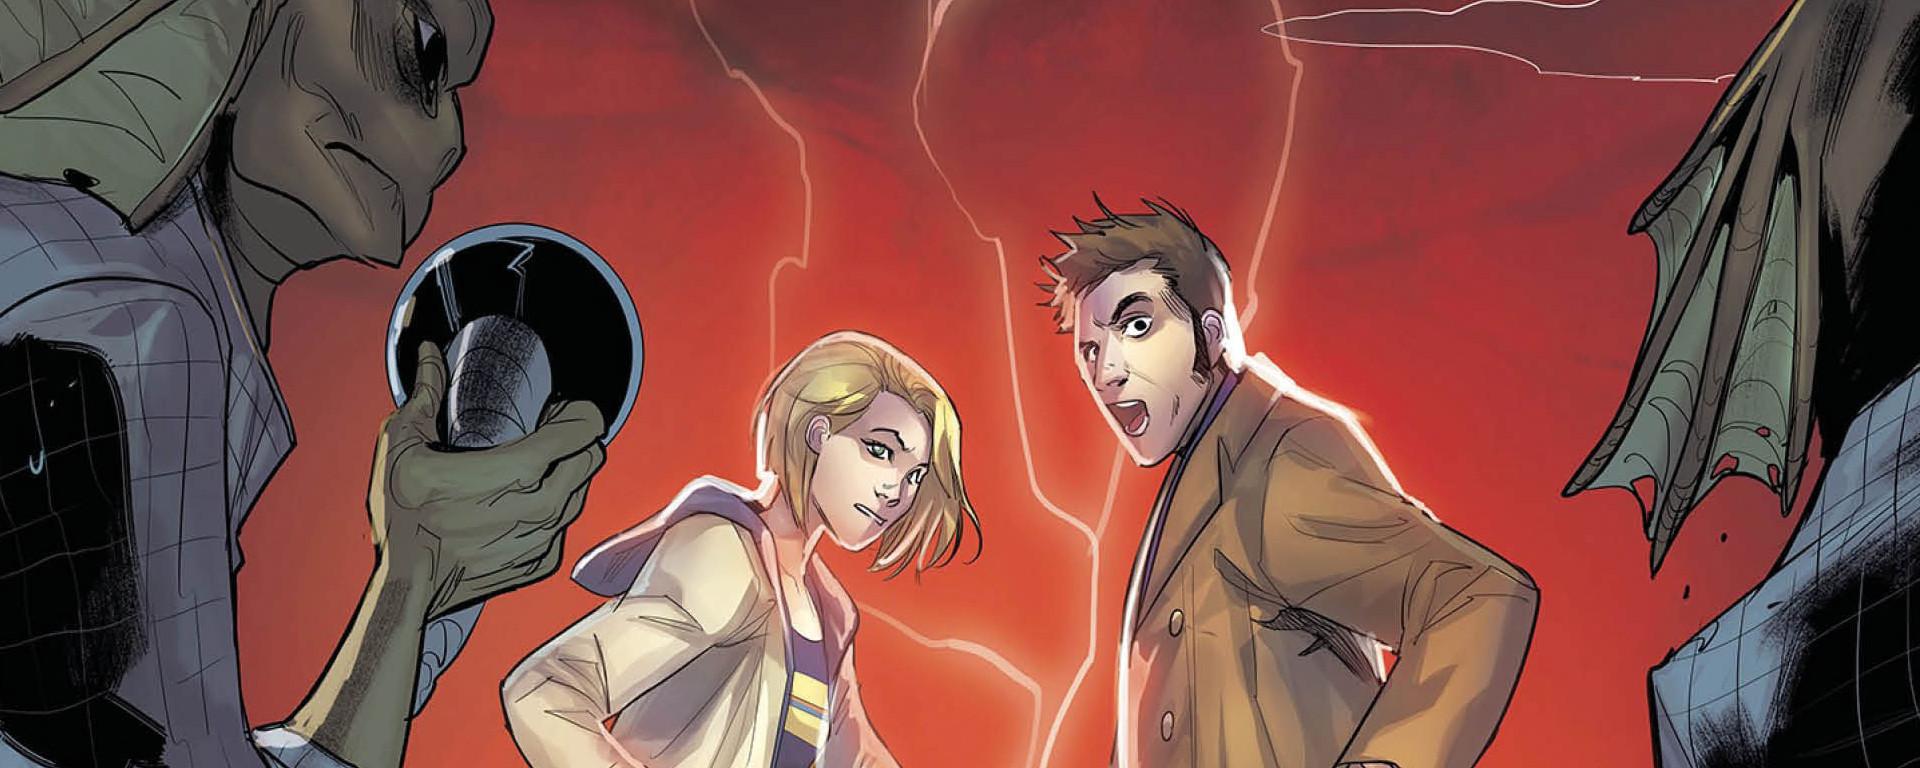 Doctor Who Comics 2020 #1 Header